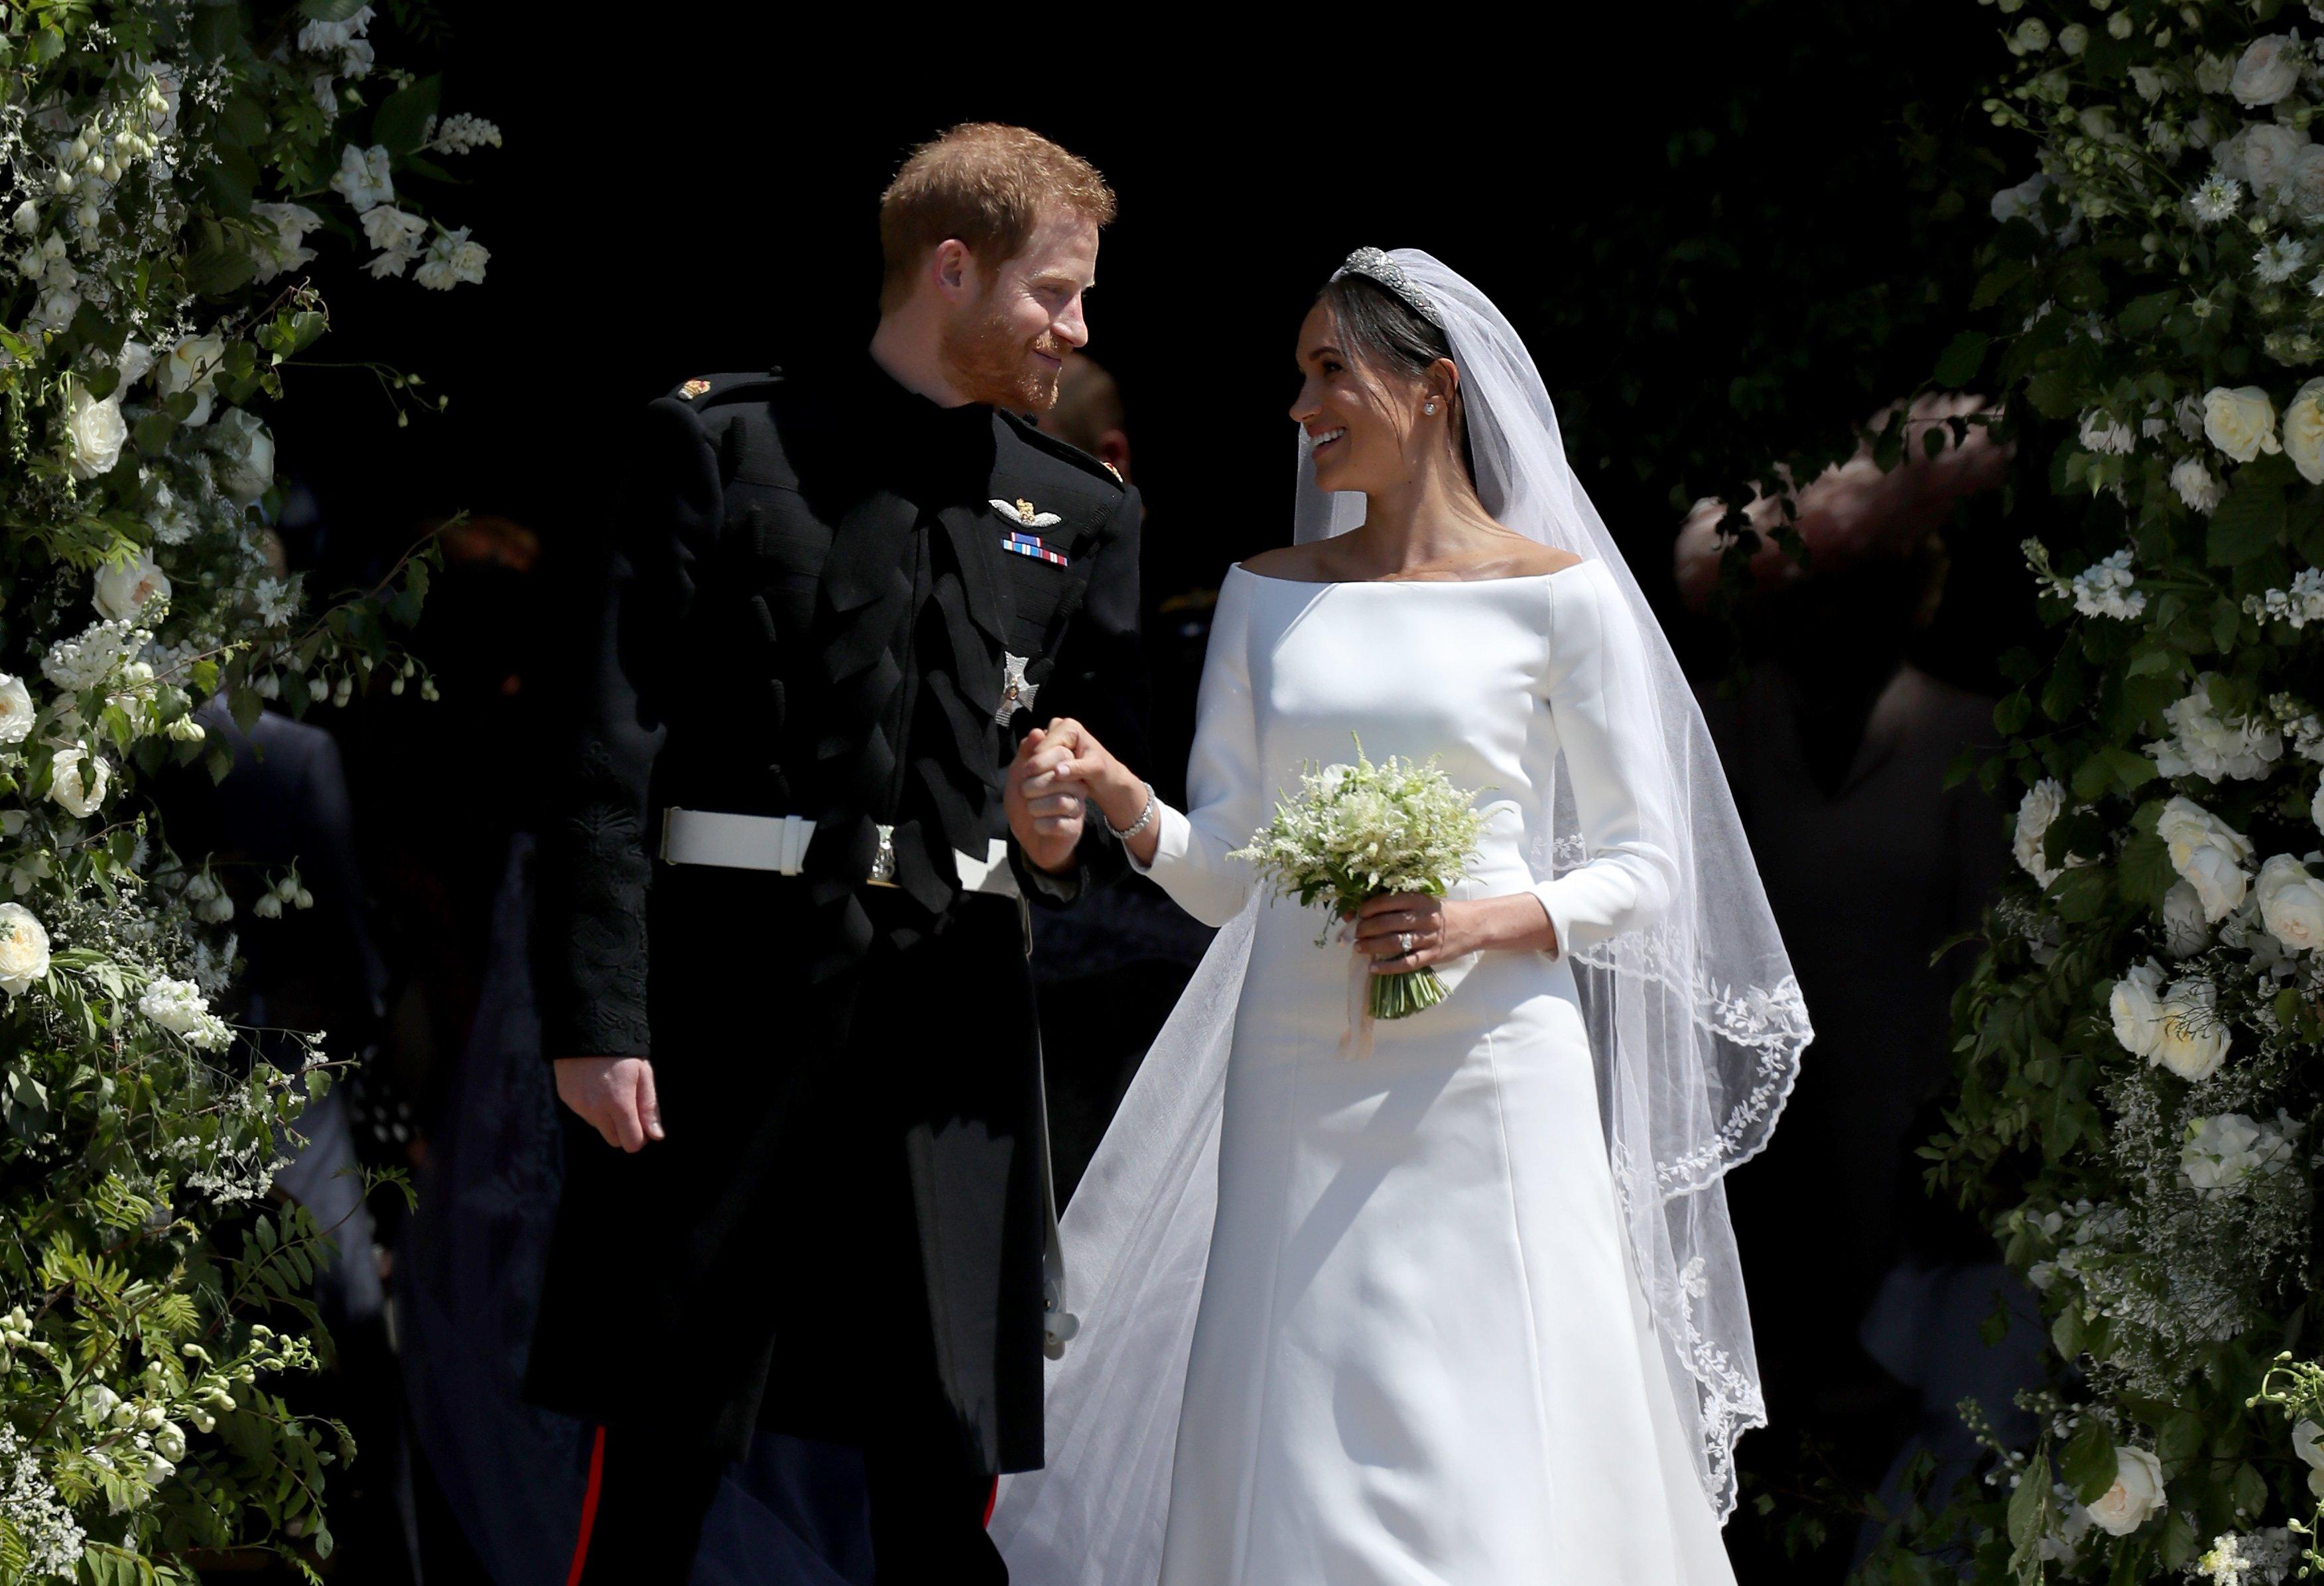 Vestidos de noiva das famosas que marcaram 2018